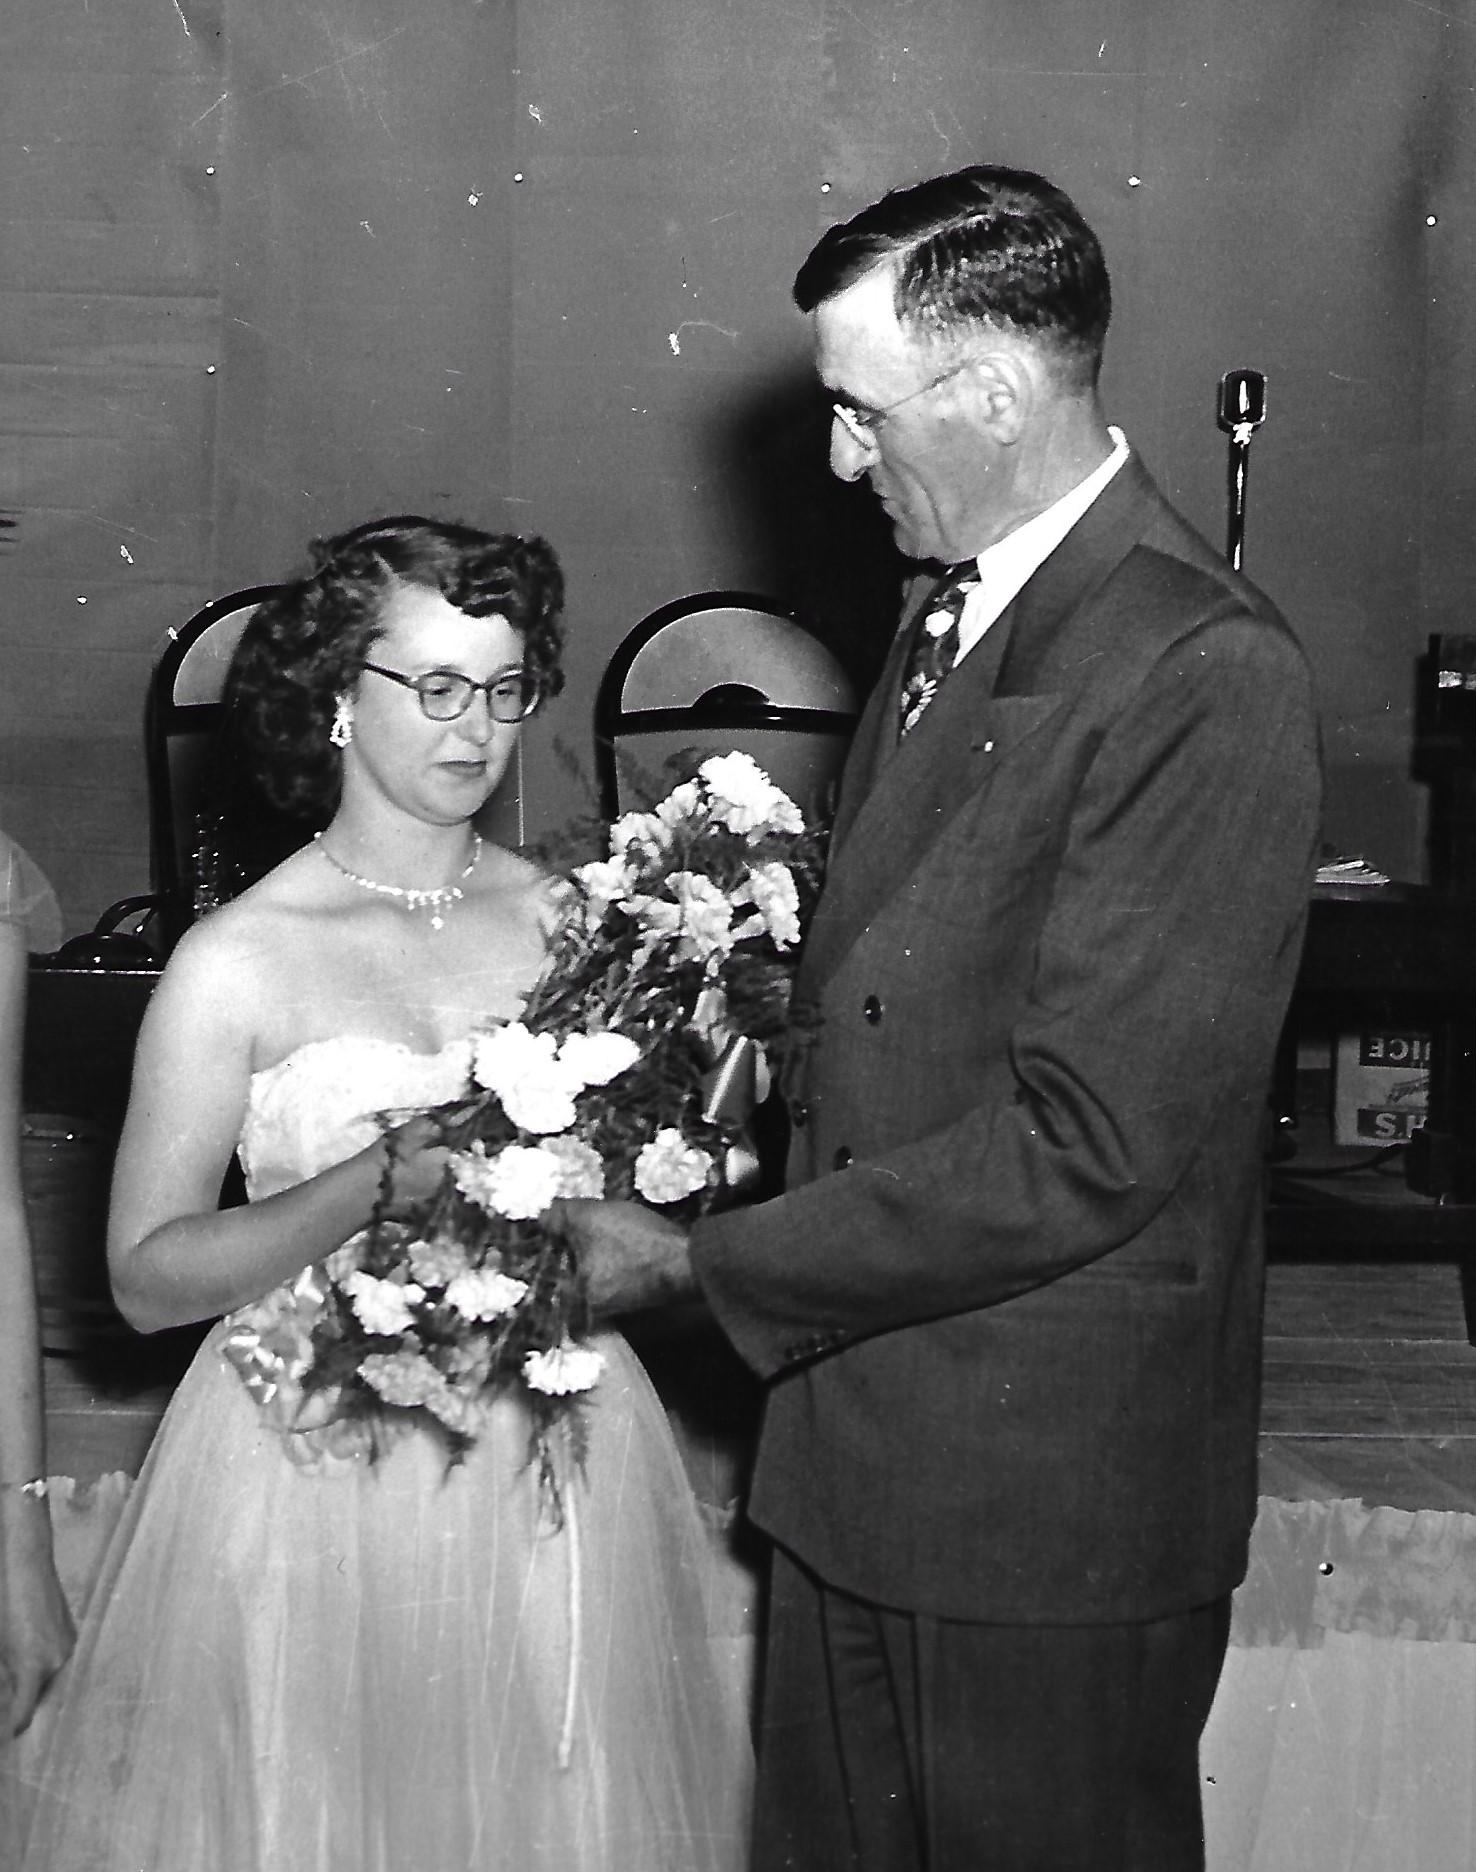 1951 Lincoln County Fair Queen